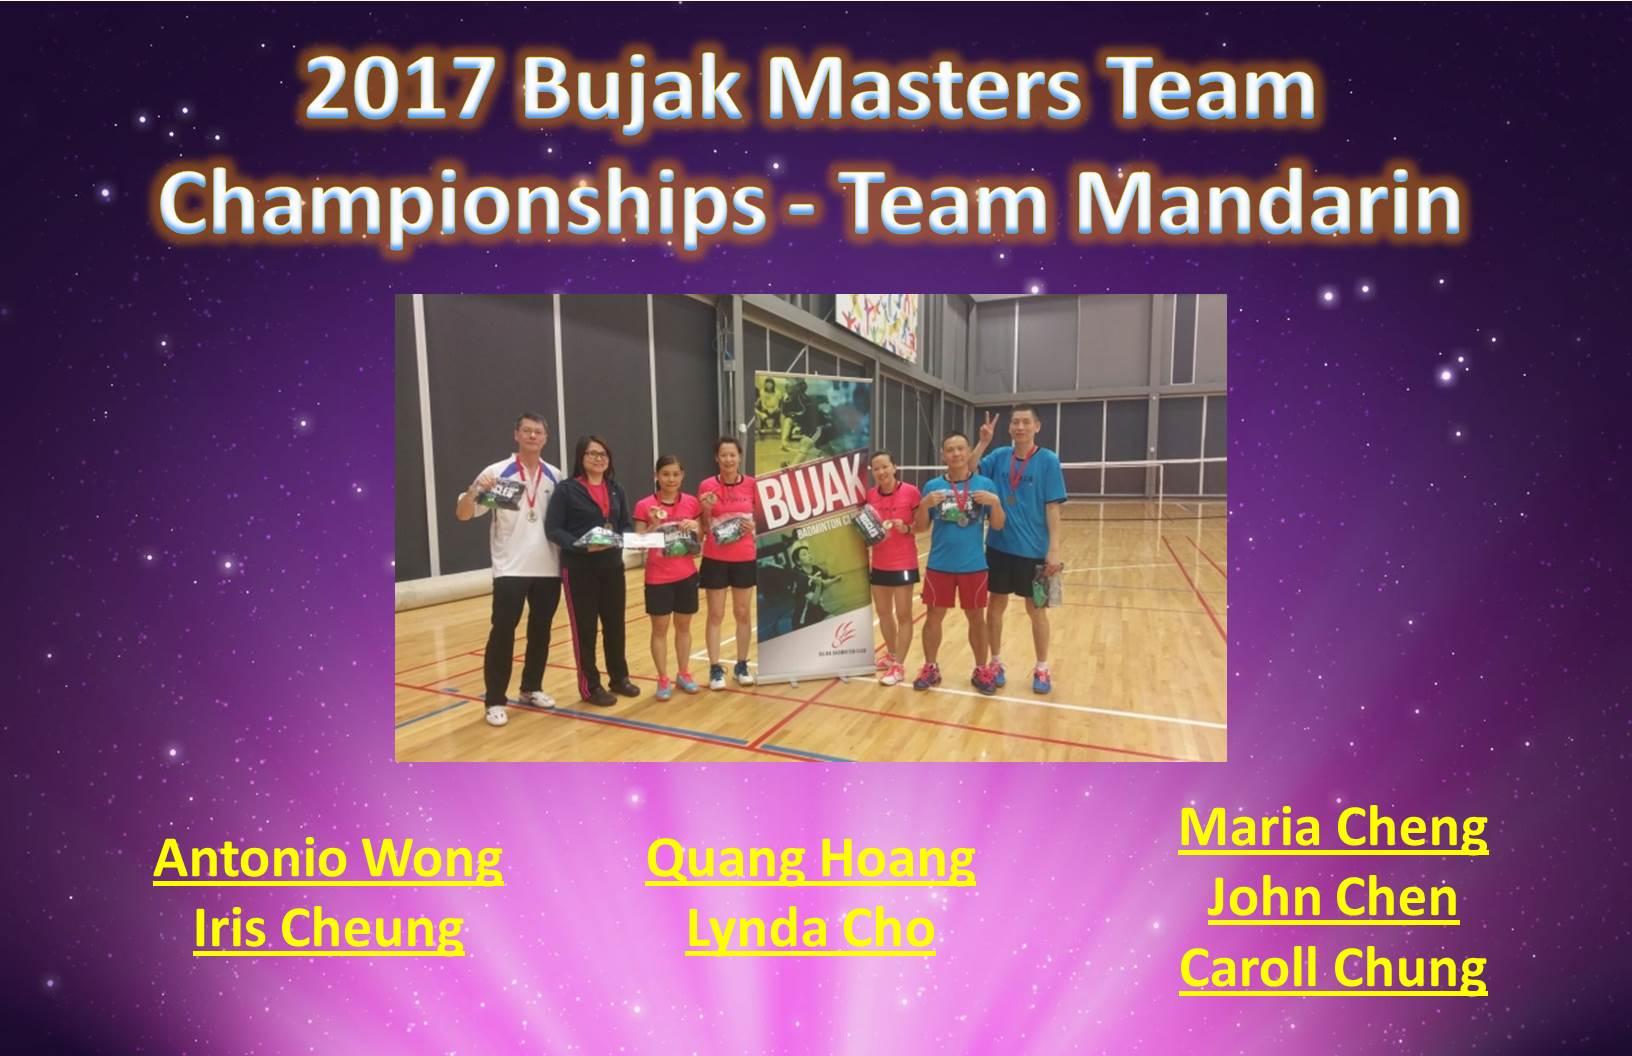 2017 Bujak Masters